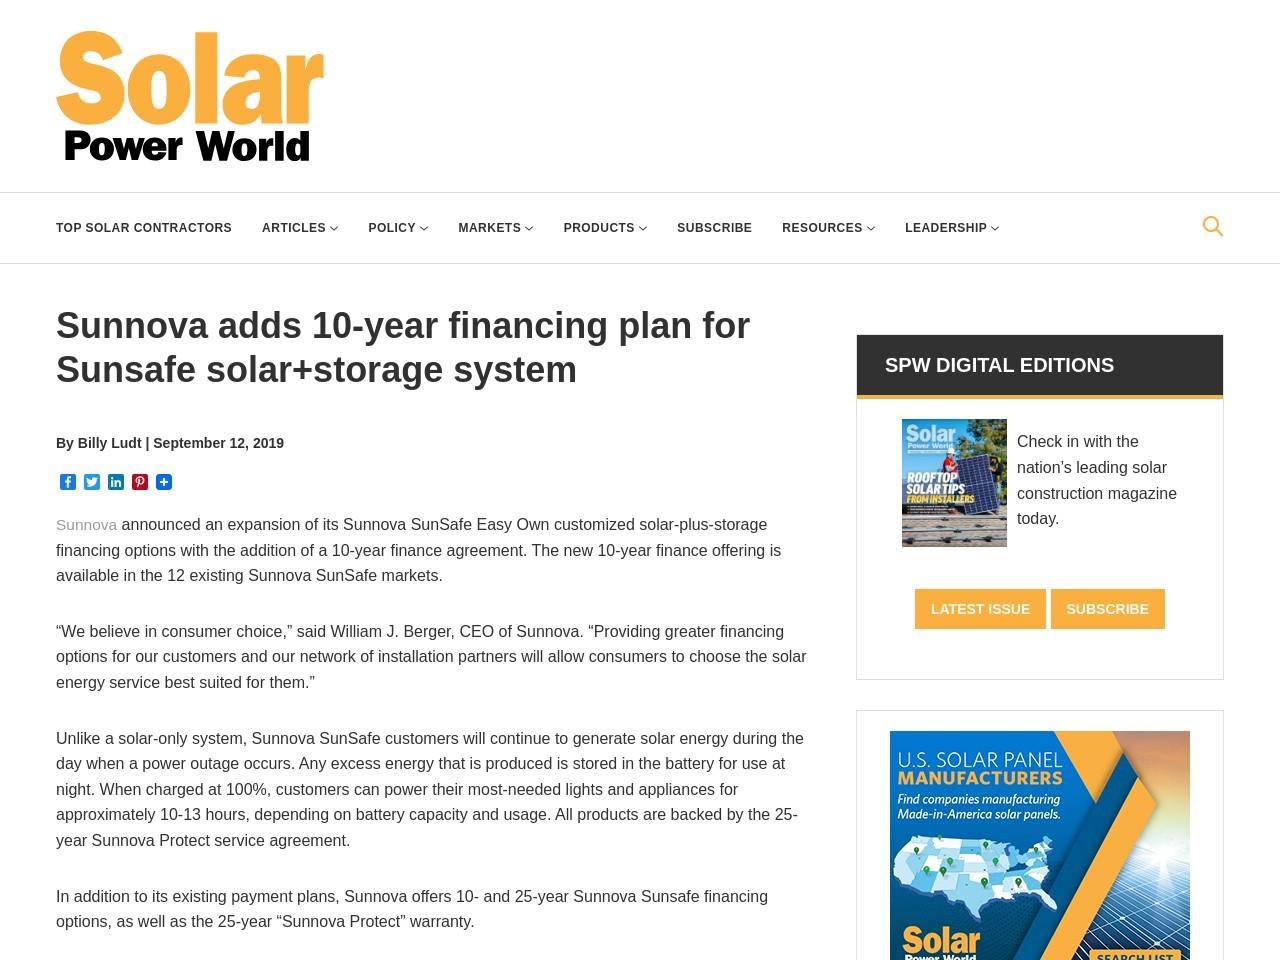 Sunnova adds 10-year financing plan for Sunsafe solar+storage system